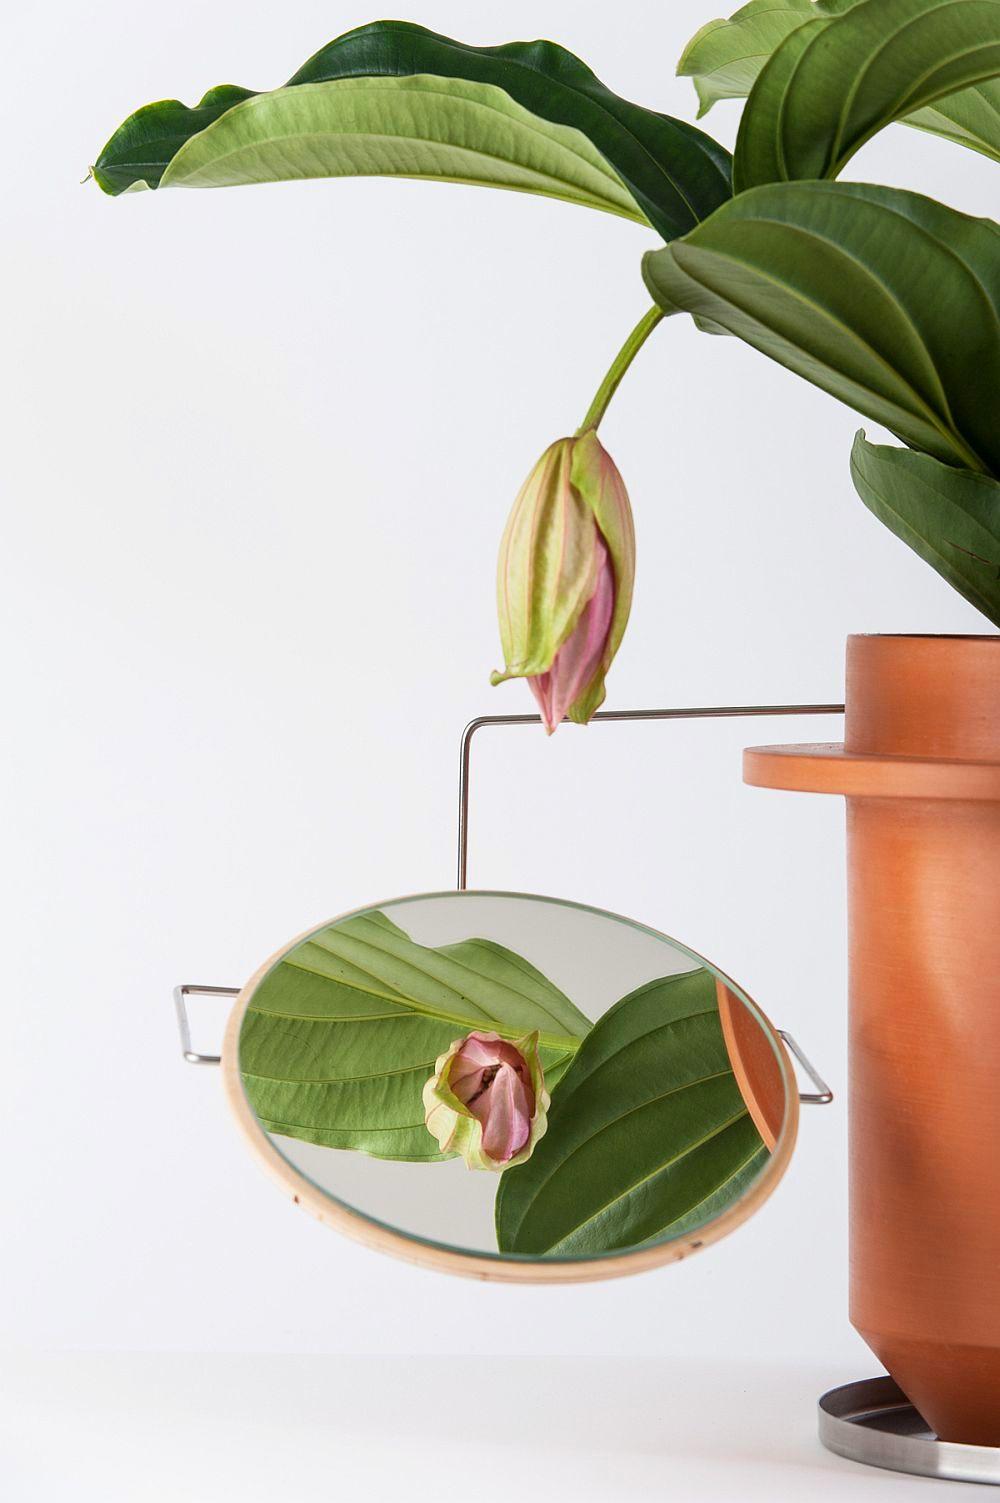 adelaparvu.com despre ghivece cu accesorii, colectia Phytophiler, designeri Dossofiorito, Foto Omar Nadalini (12)